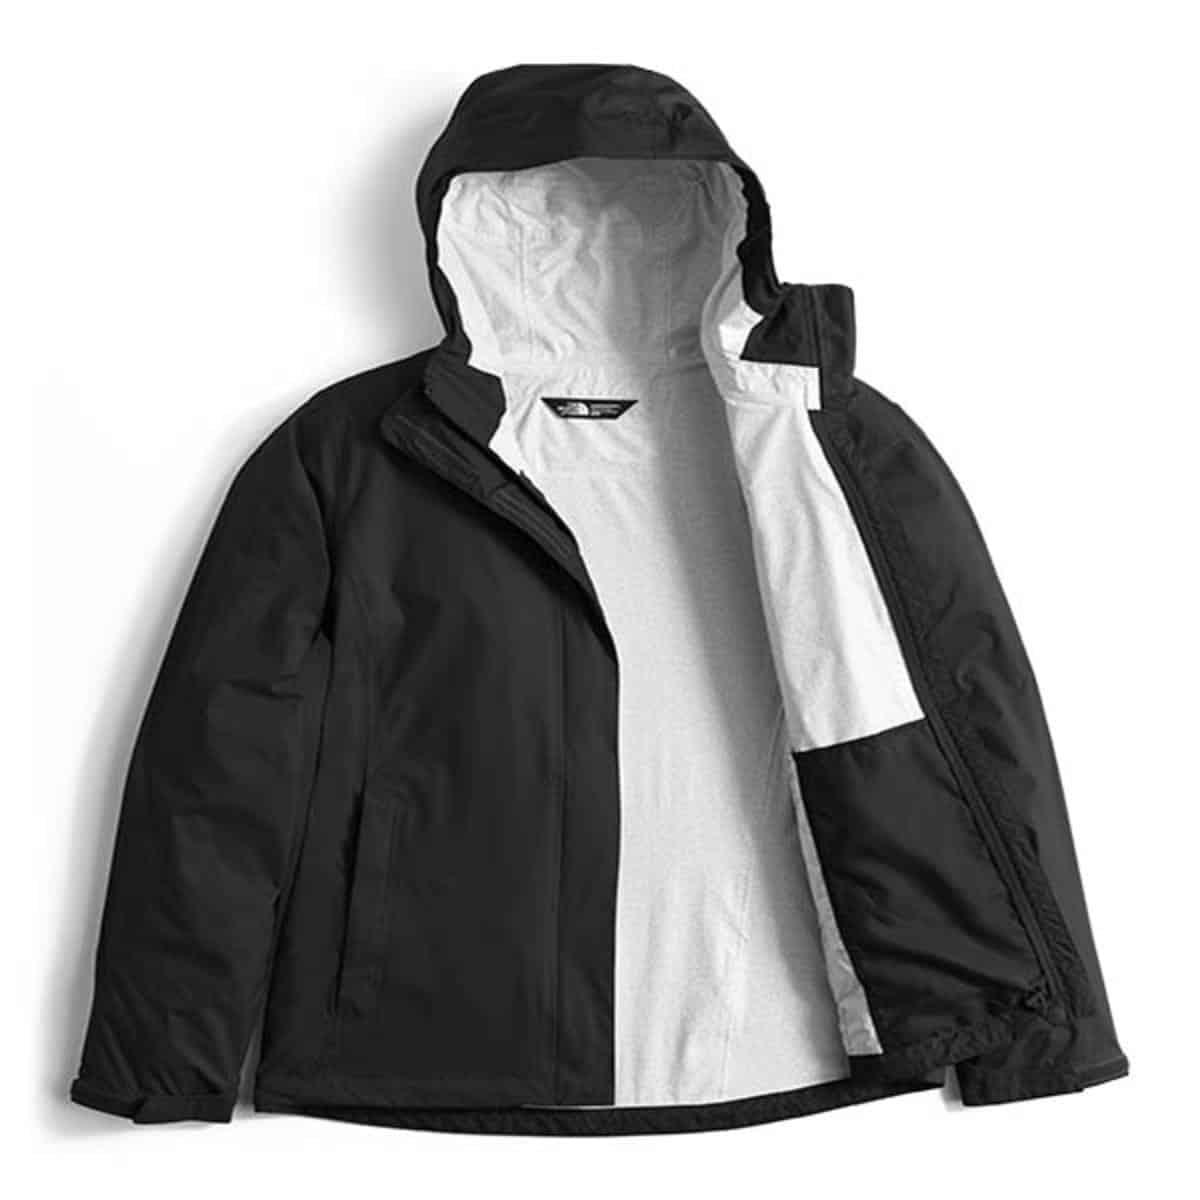 the-north-face-women-s-venture-2-jacket-black-52